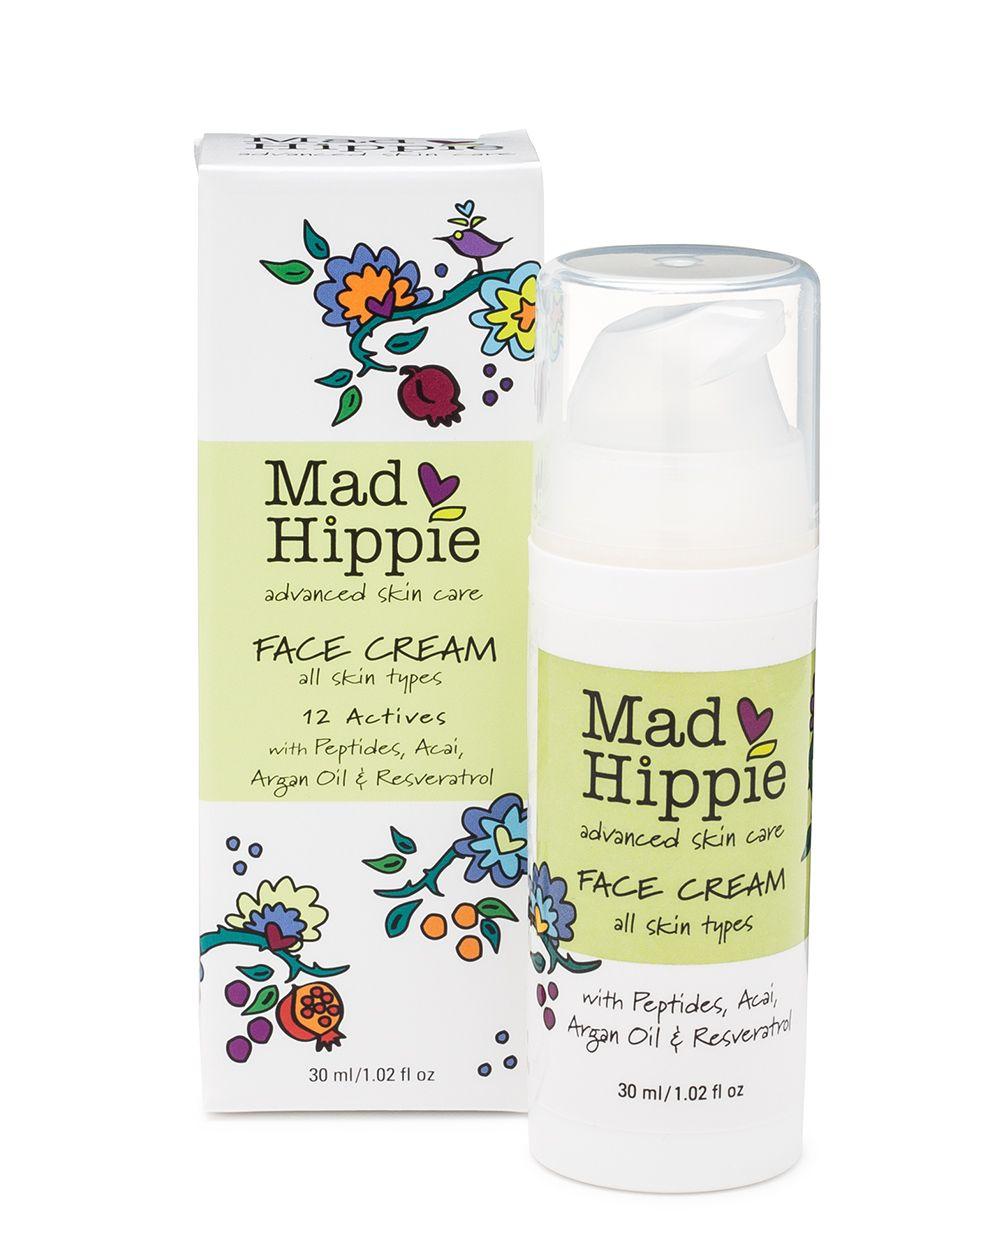 Face Cream Mad Hippie Skin Care Mad Hippie Face Cream